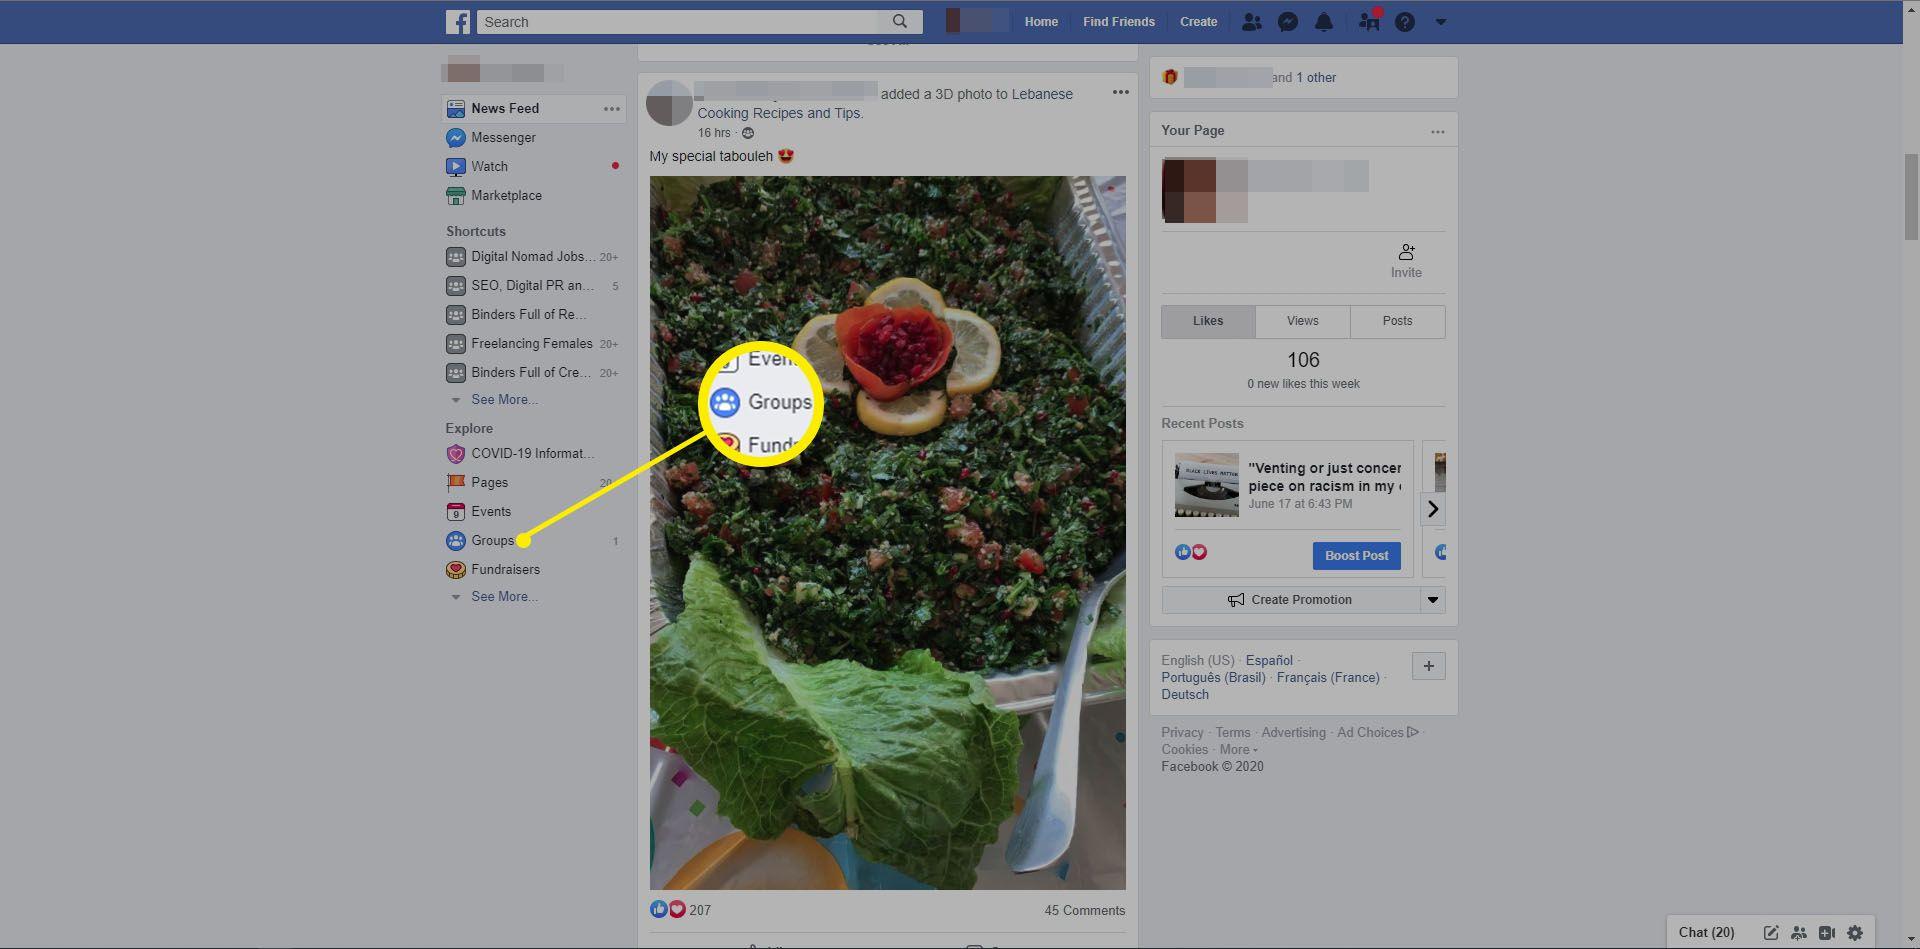 Selecting Groups in Facebook website.